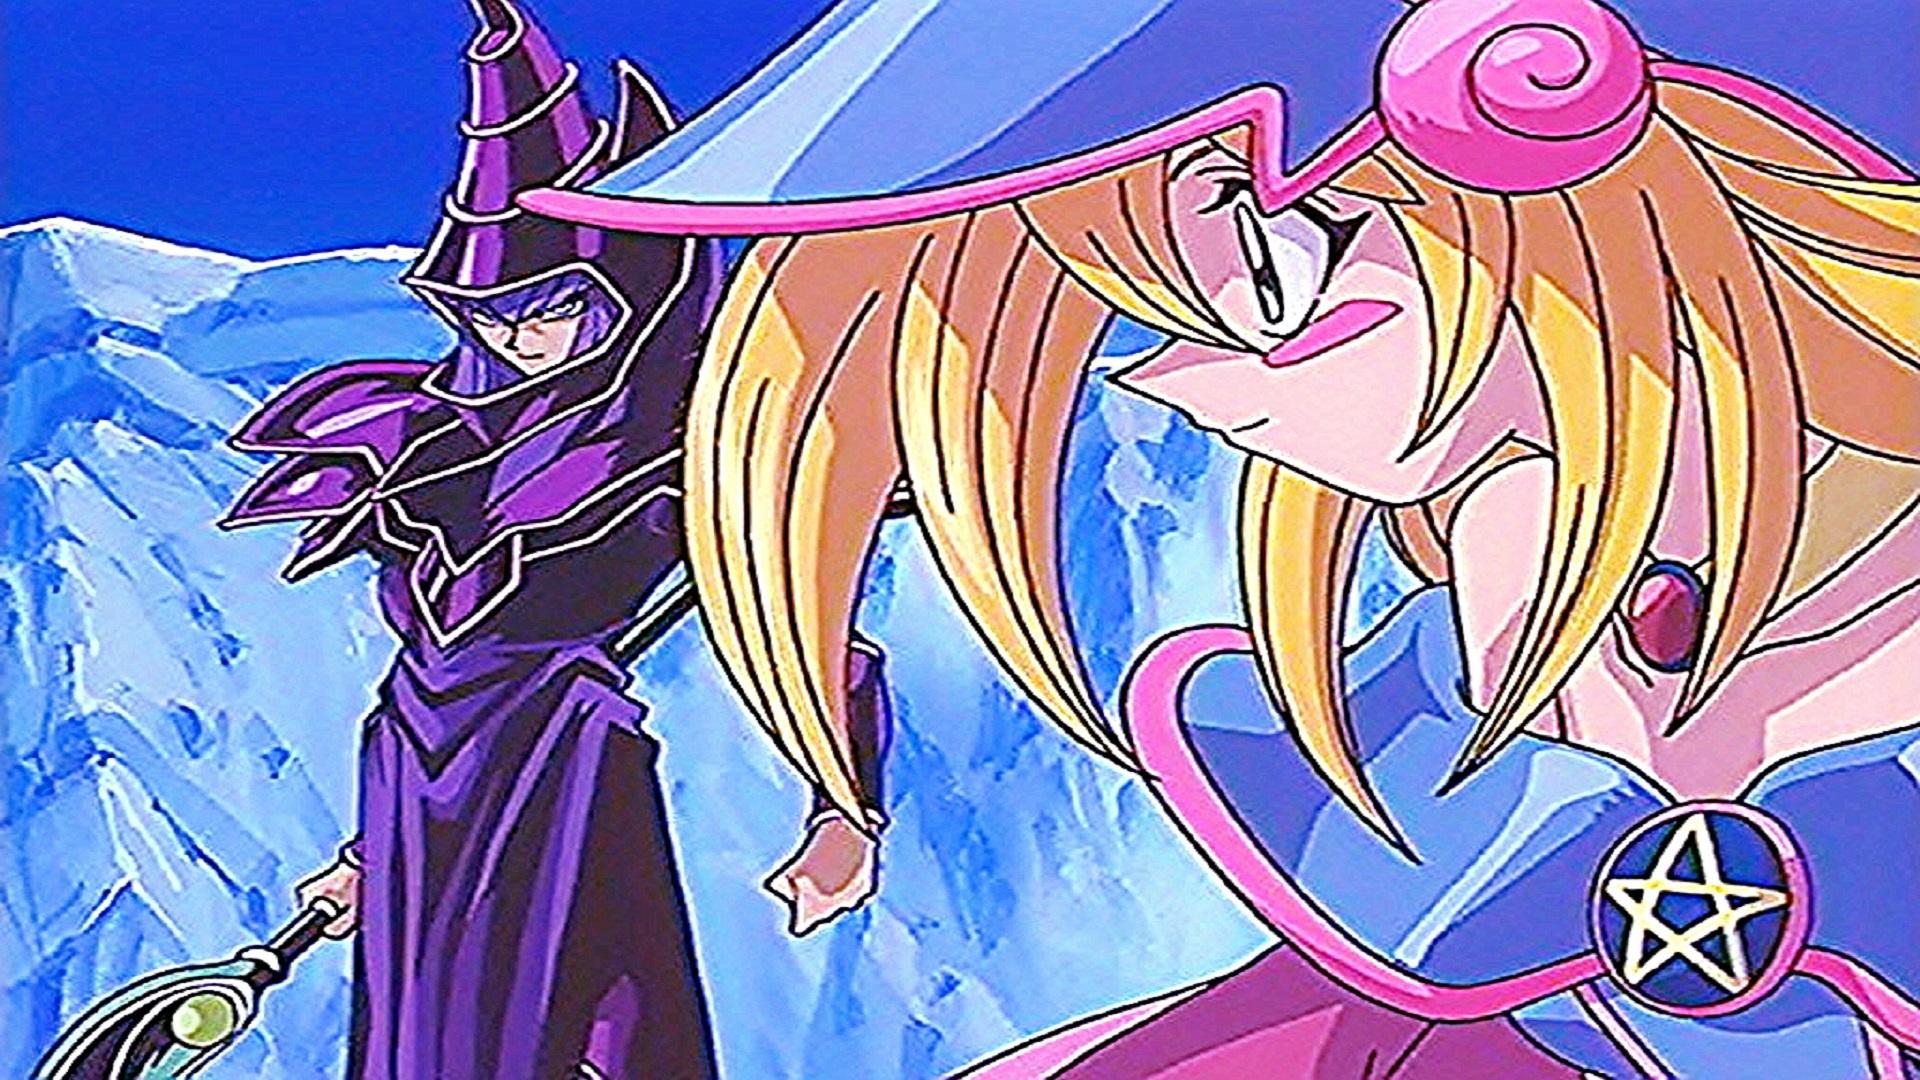 Yugioh Dark Magician And Dark Magician Girl 1 By Chrisman83 On